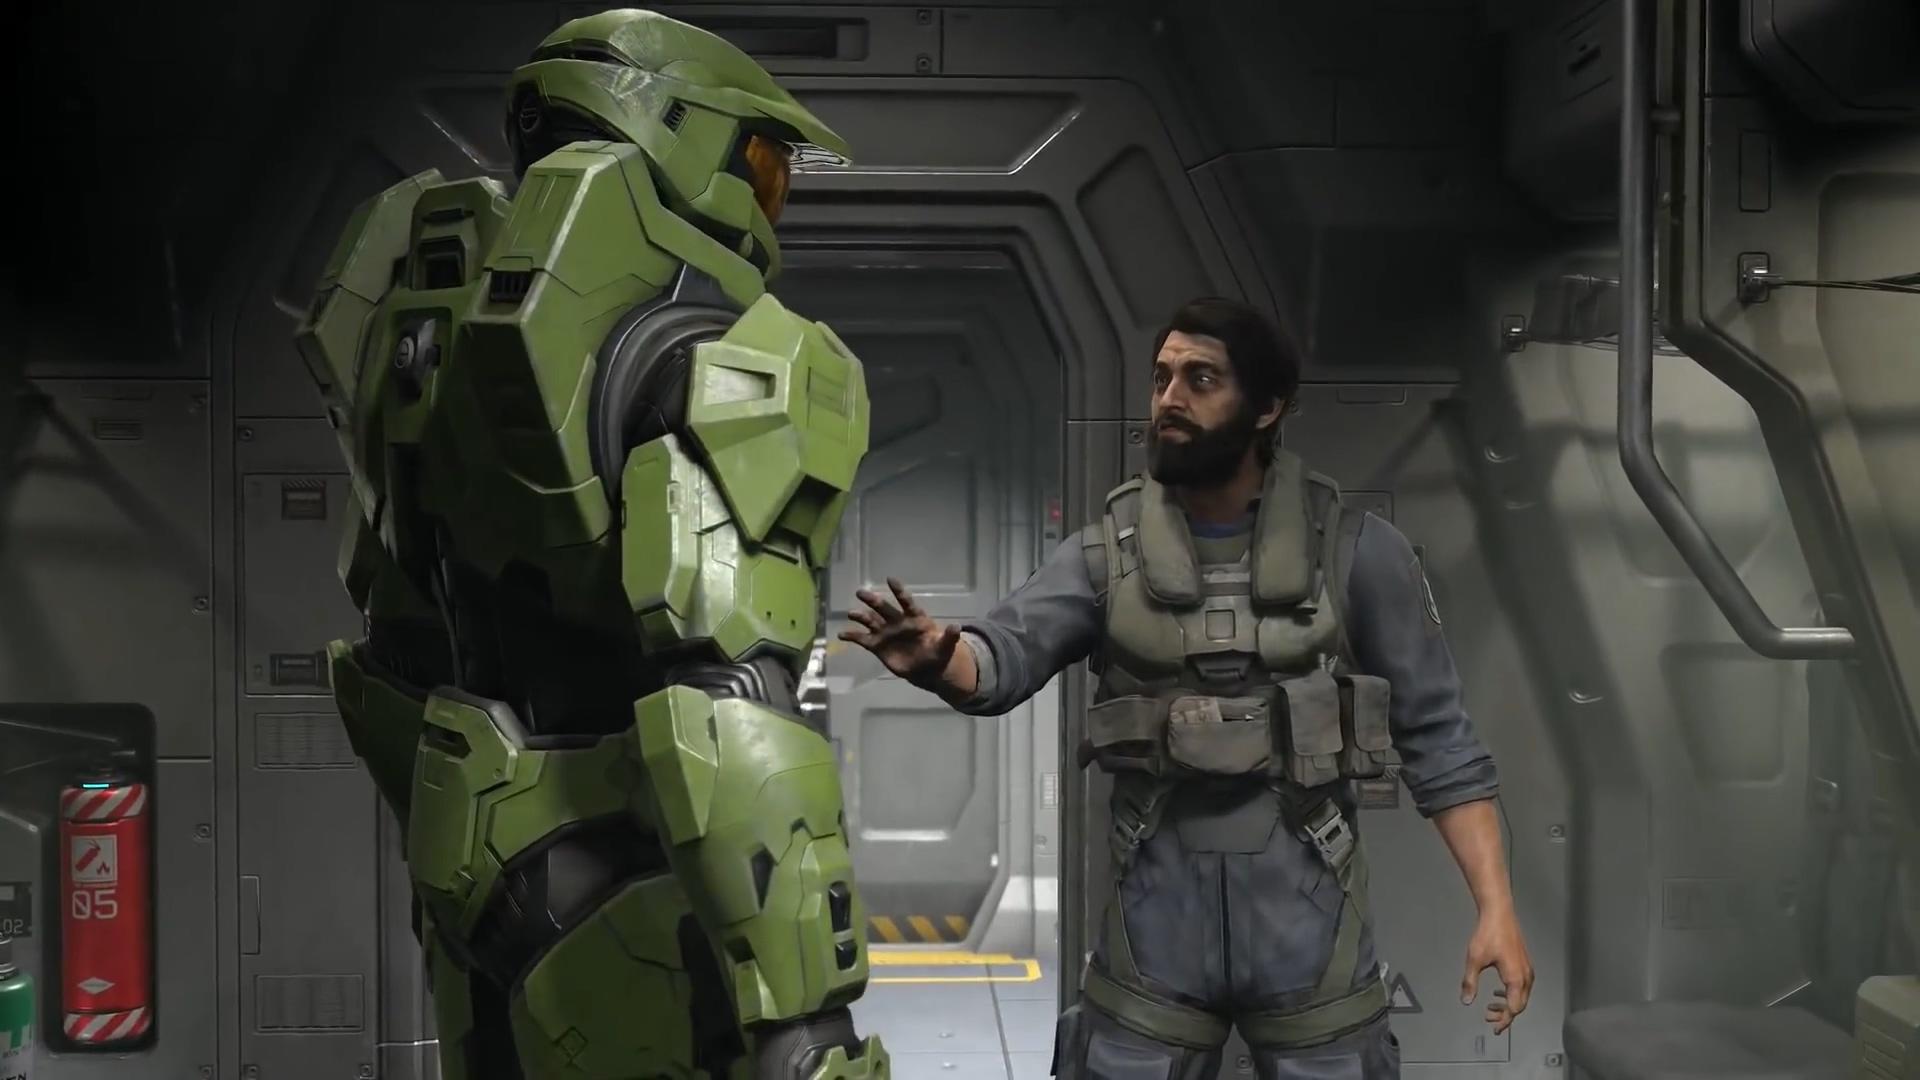 Halo Infinite 8.jpg - Halo Infinite